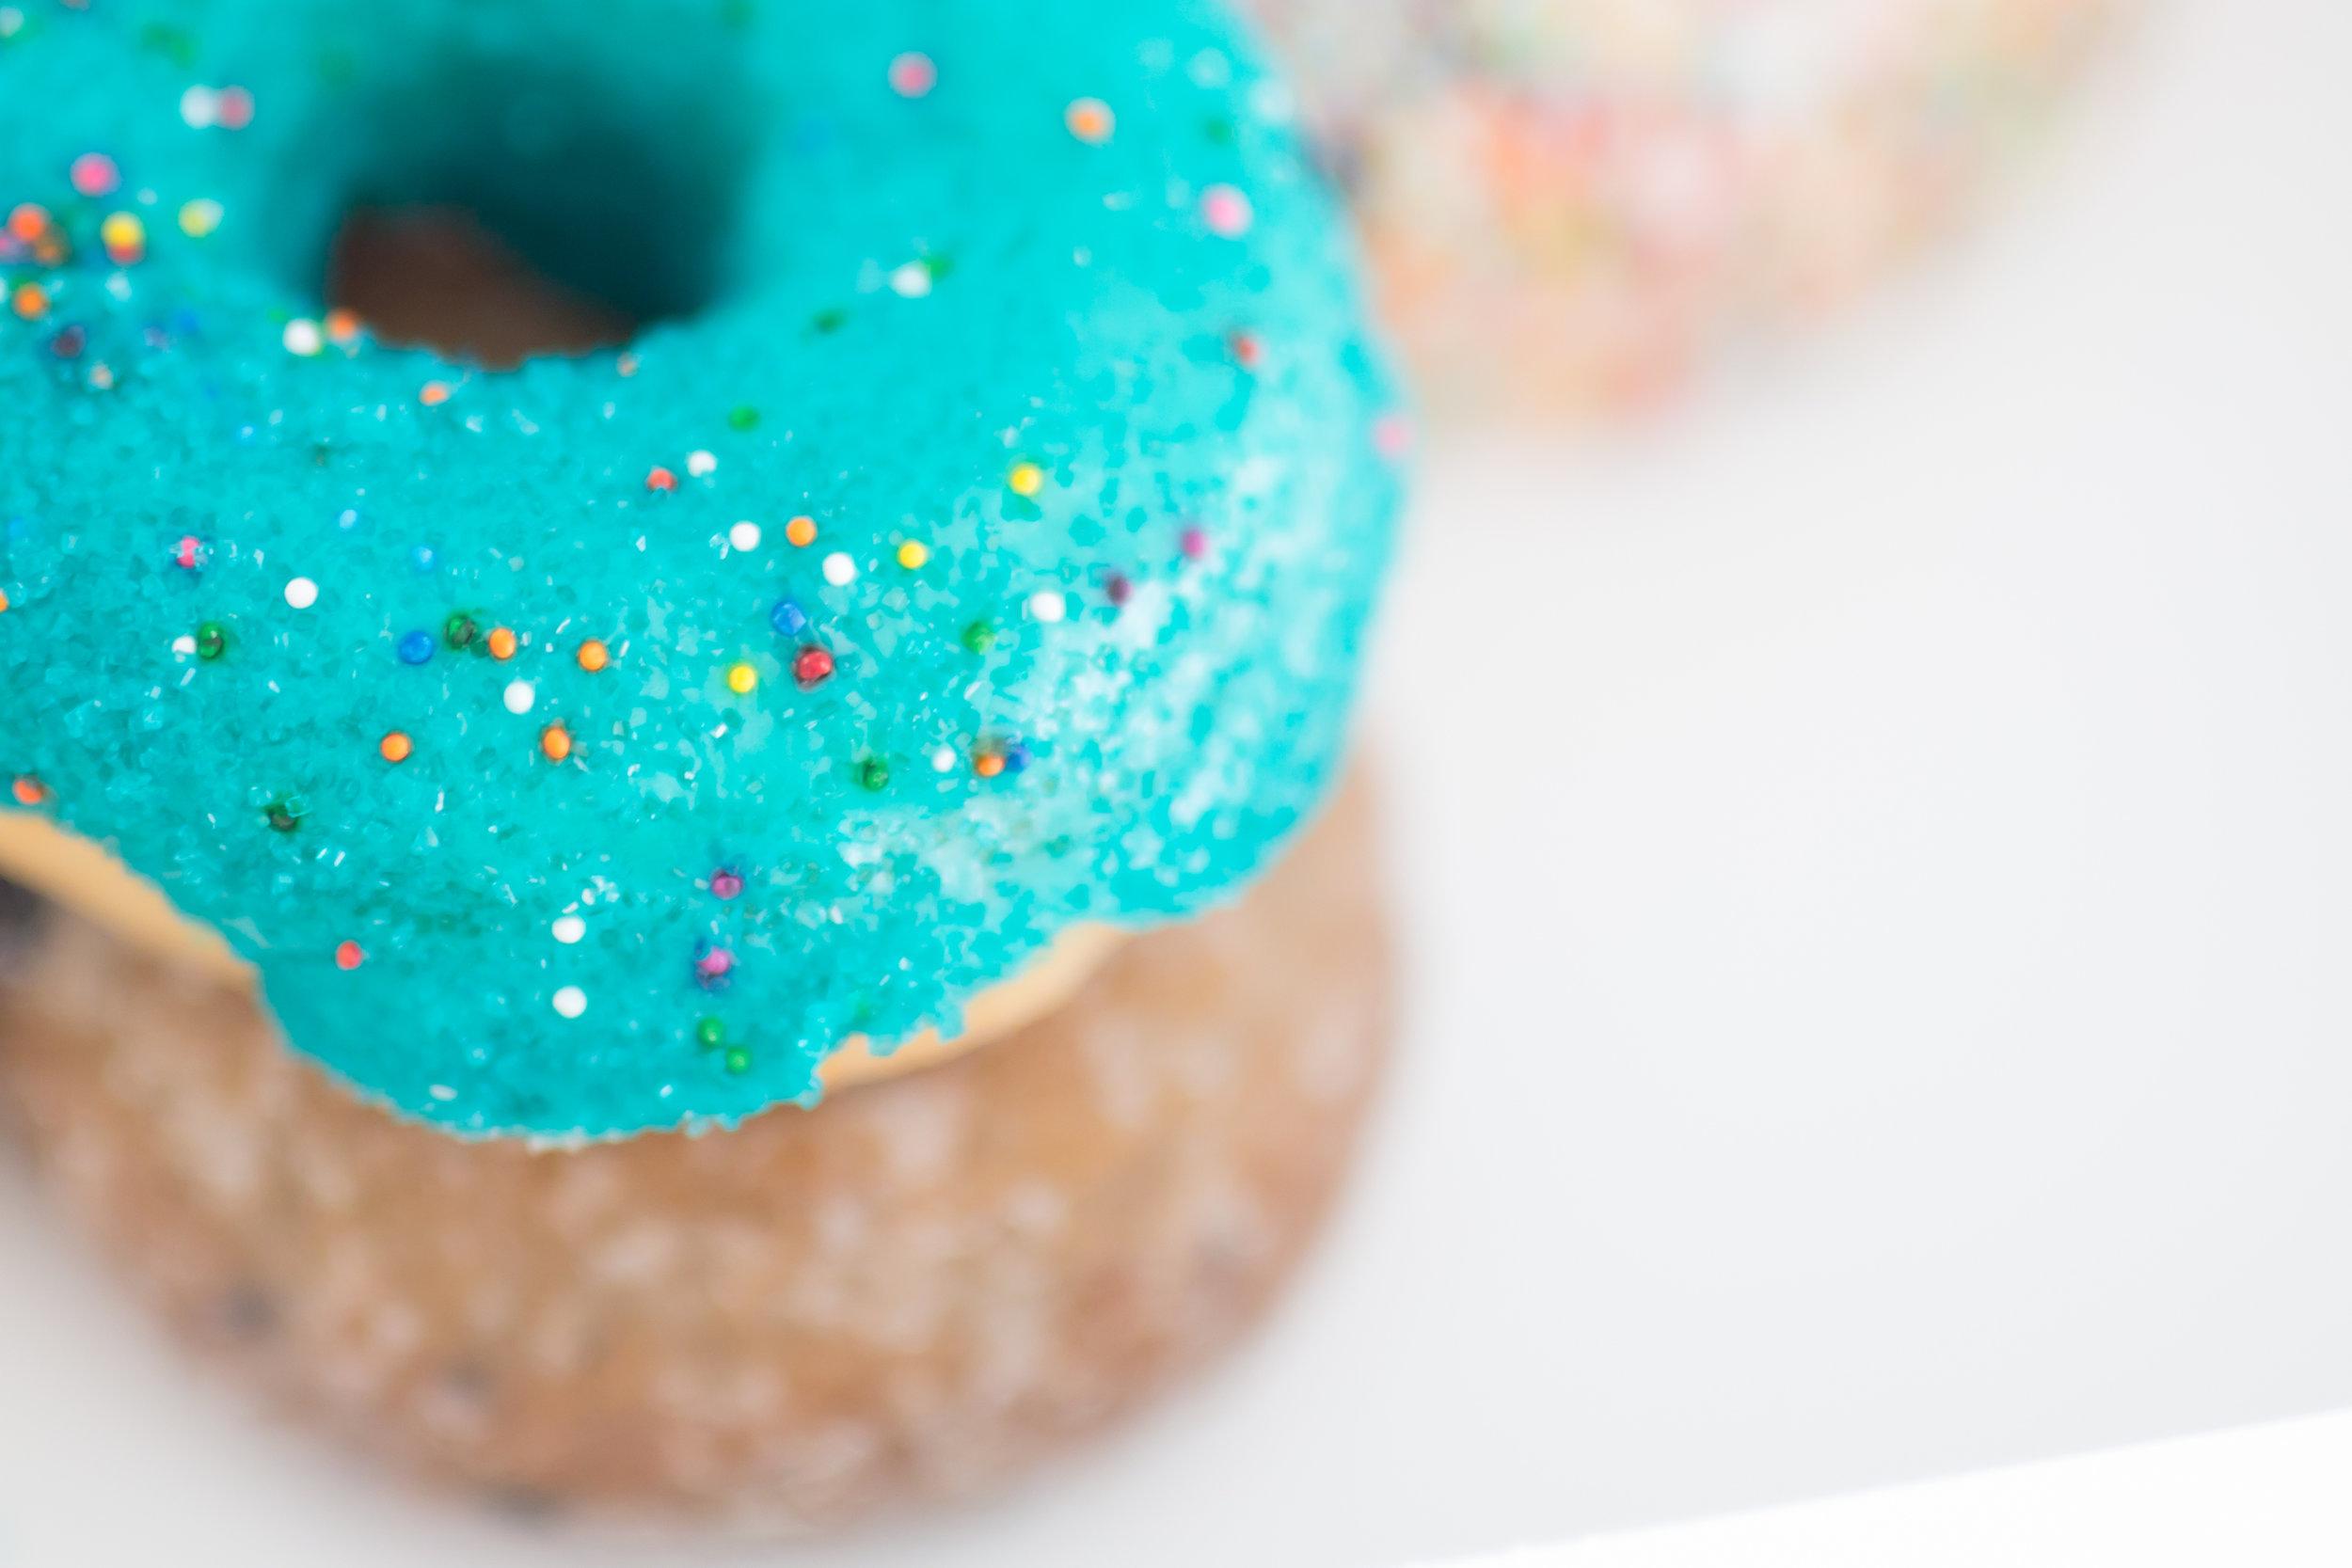 Livi Lees - Donuts - Tulsa Oklahoma - Handcrafted donuts - Sprinkles